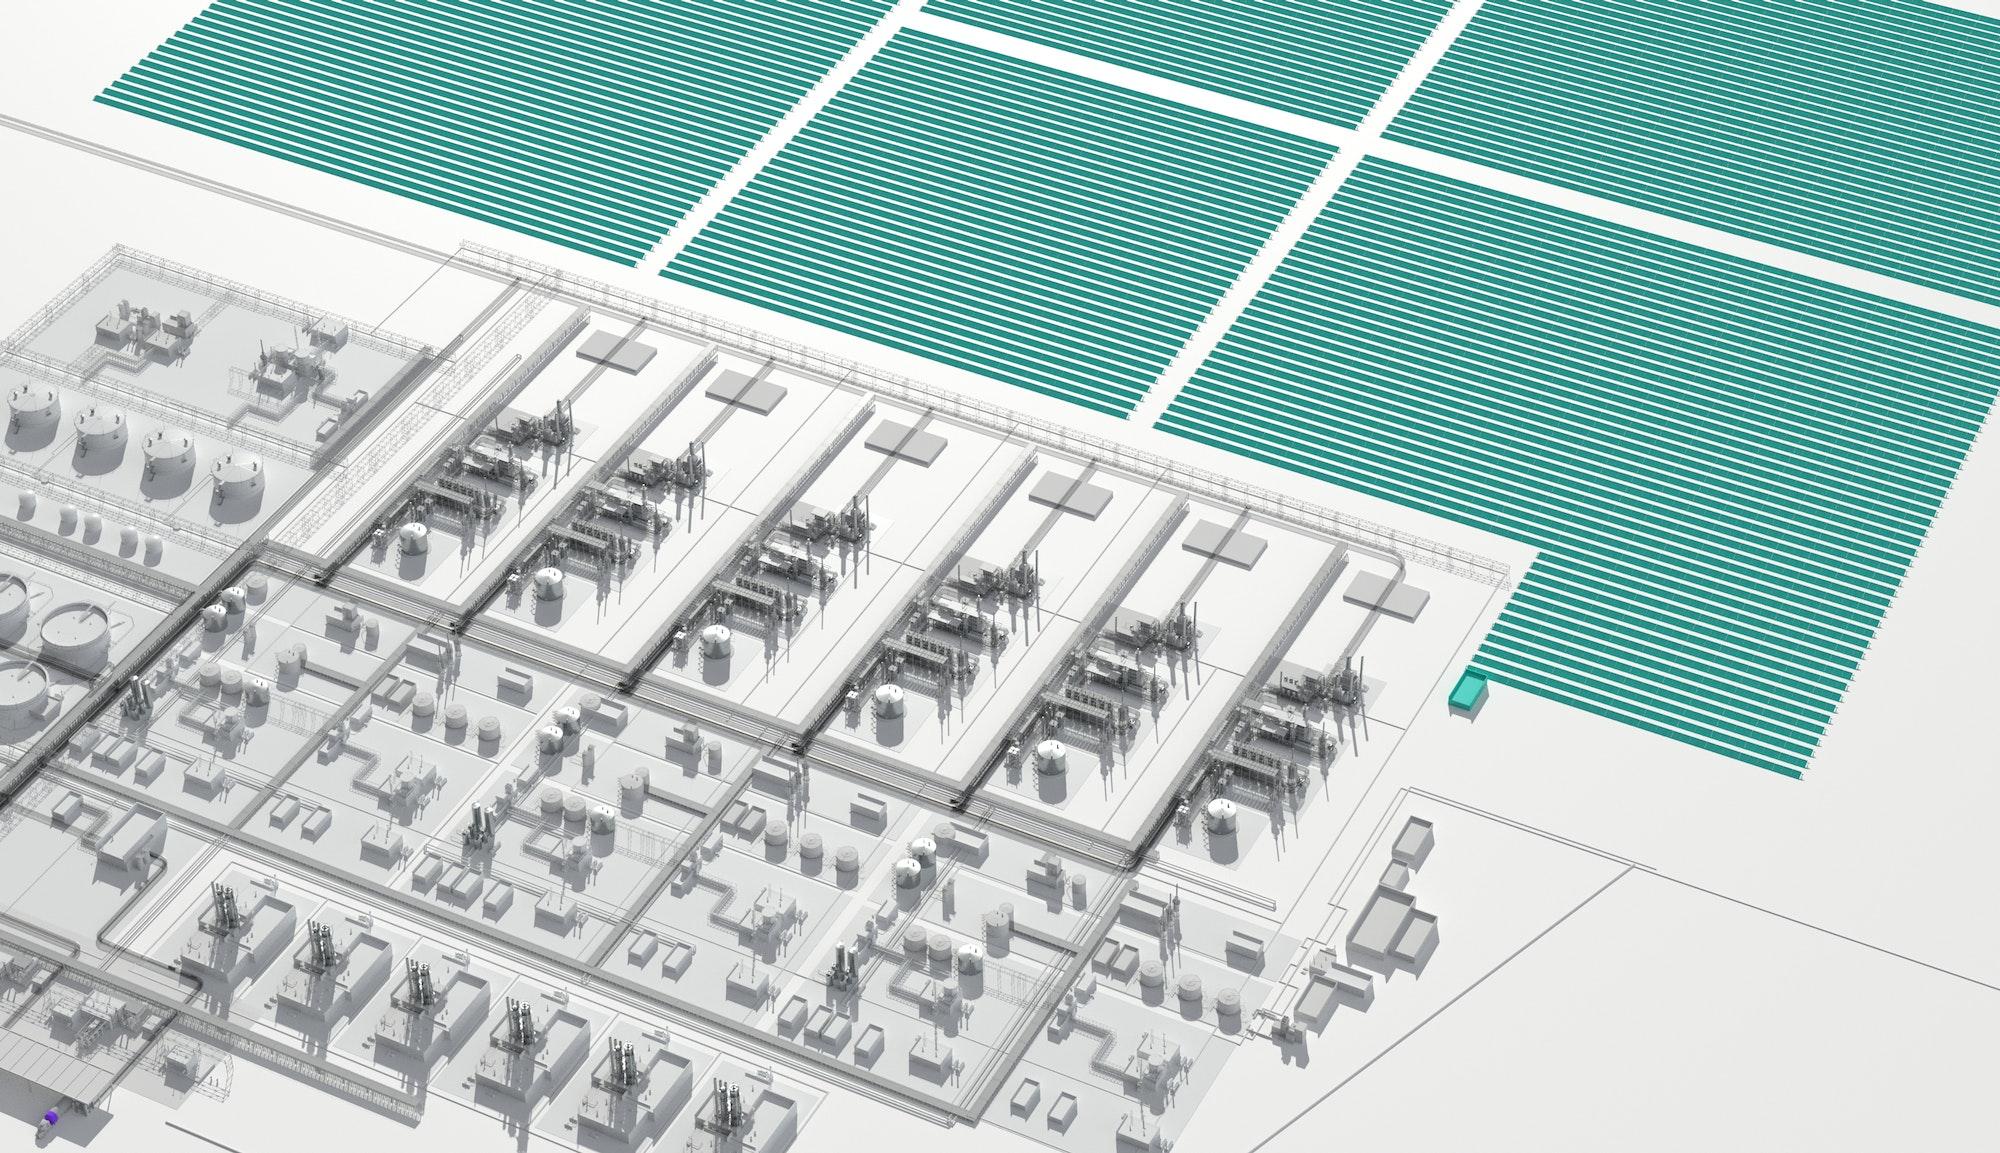 Integrated solar power generation